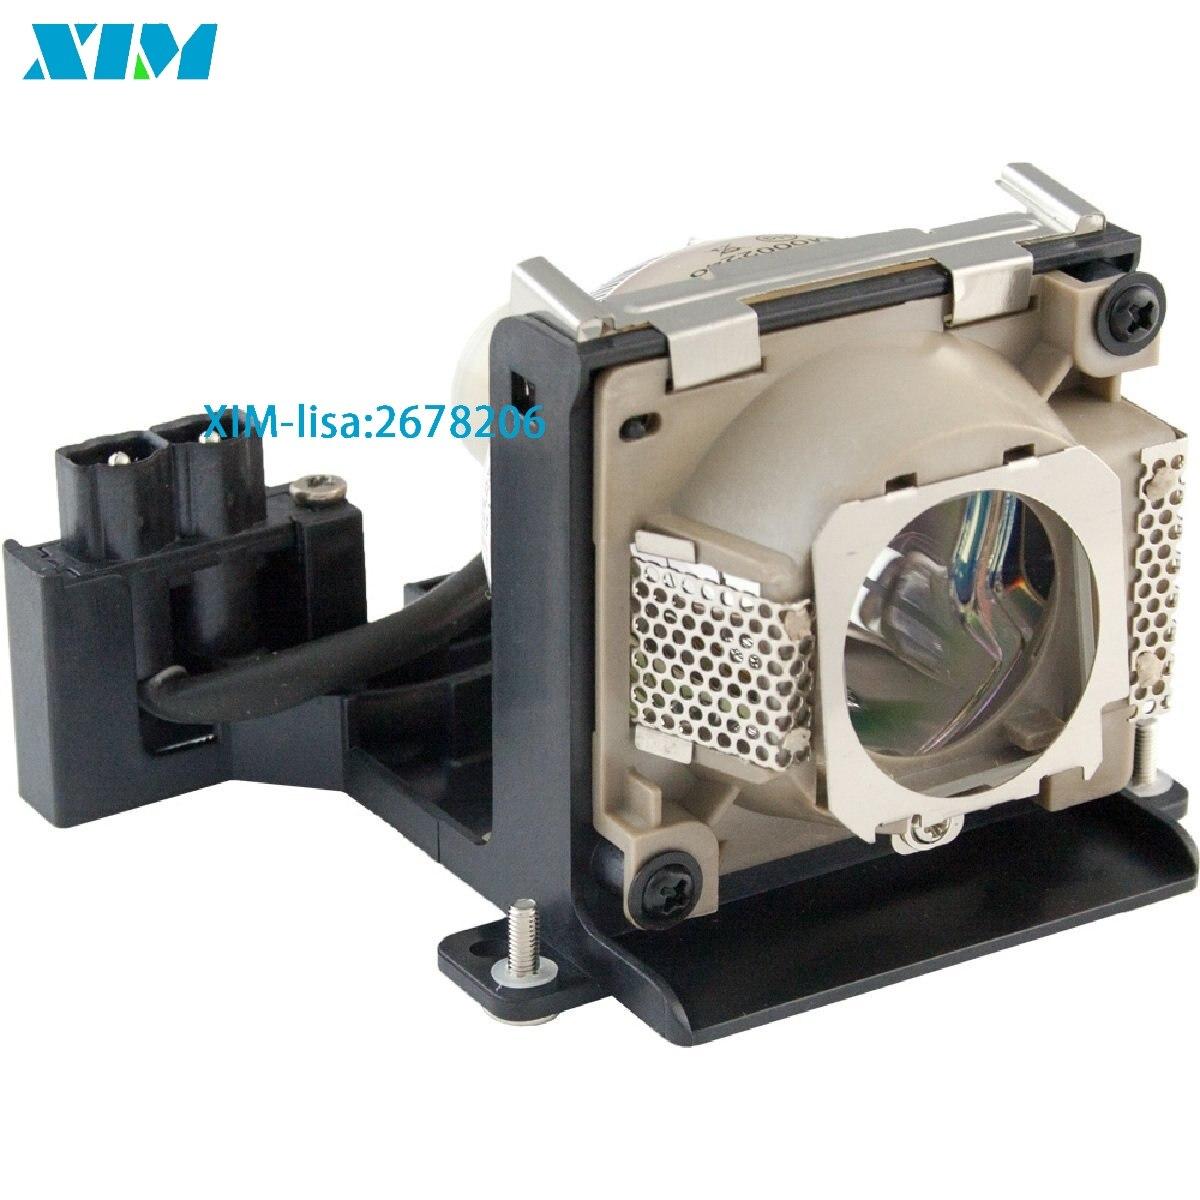 все цены на 60.J5016.CB1 Replacement Projector Lamp with Housing for BENQ PB7000 / PB7100 / PB7105 / PB7200 / PB7205 / PB7220 / PB7225 онлайн